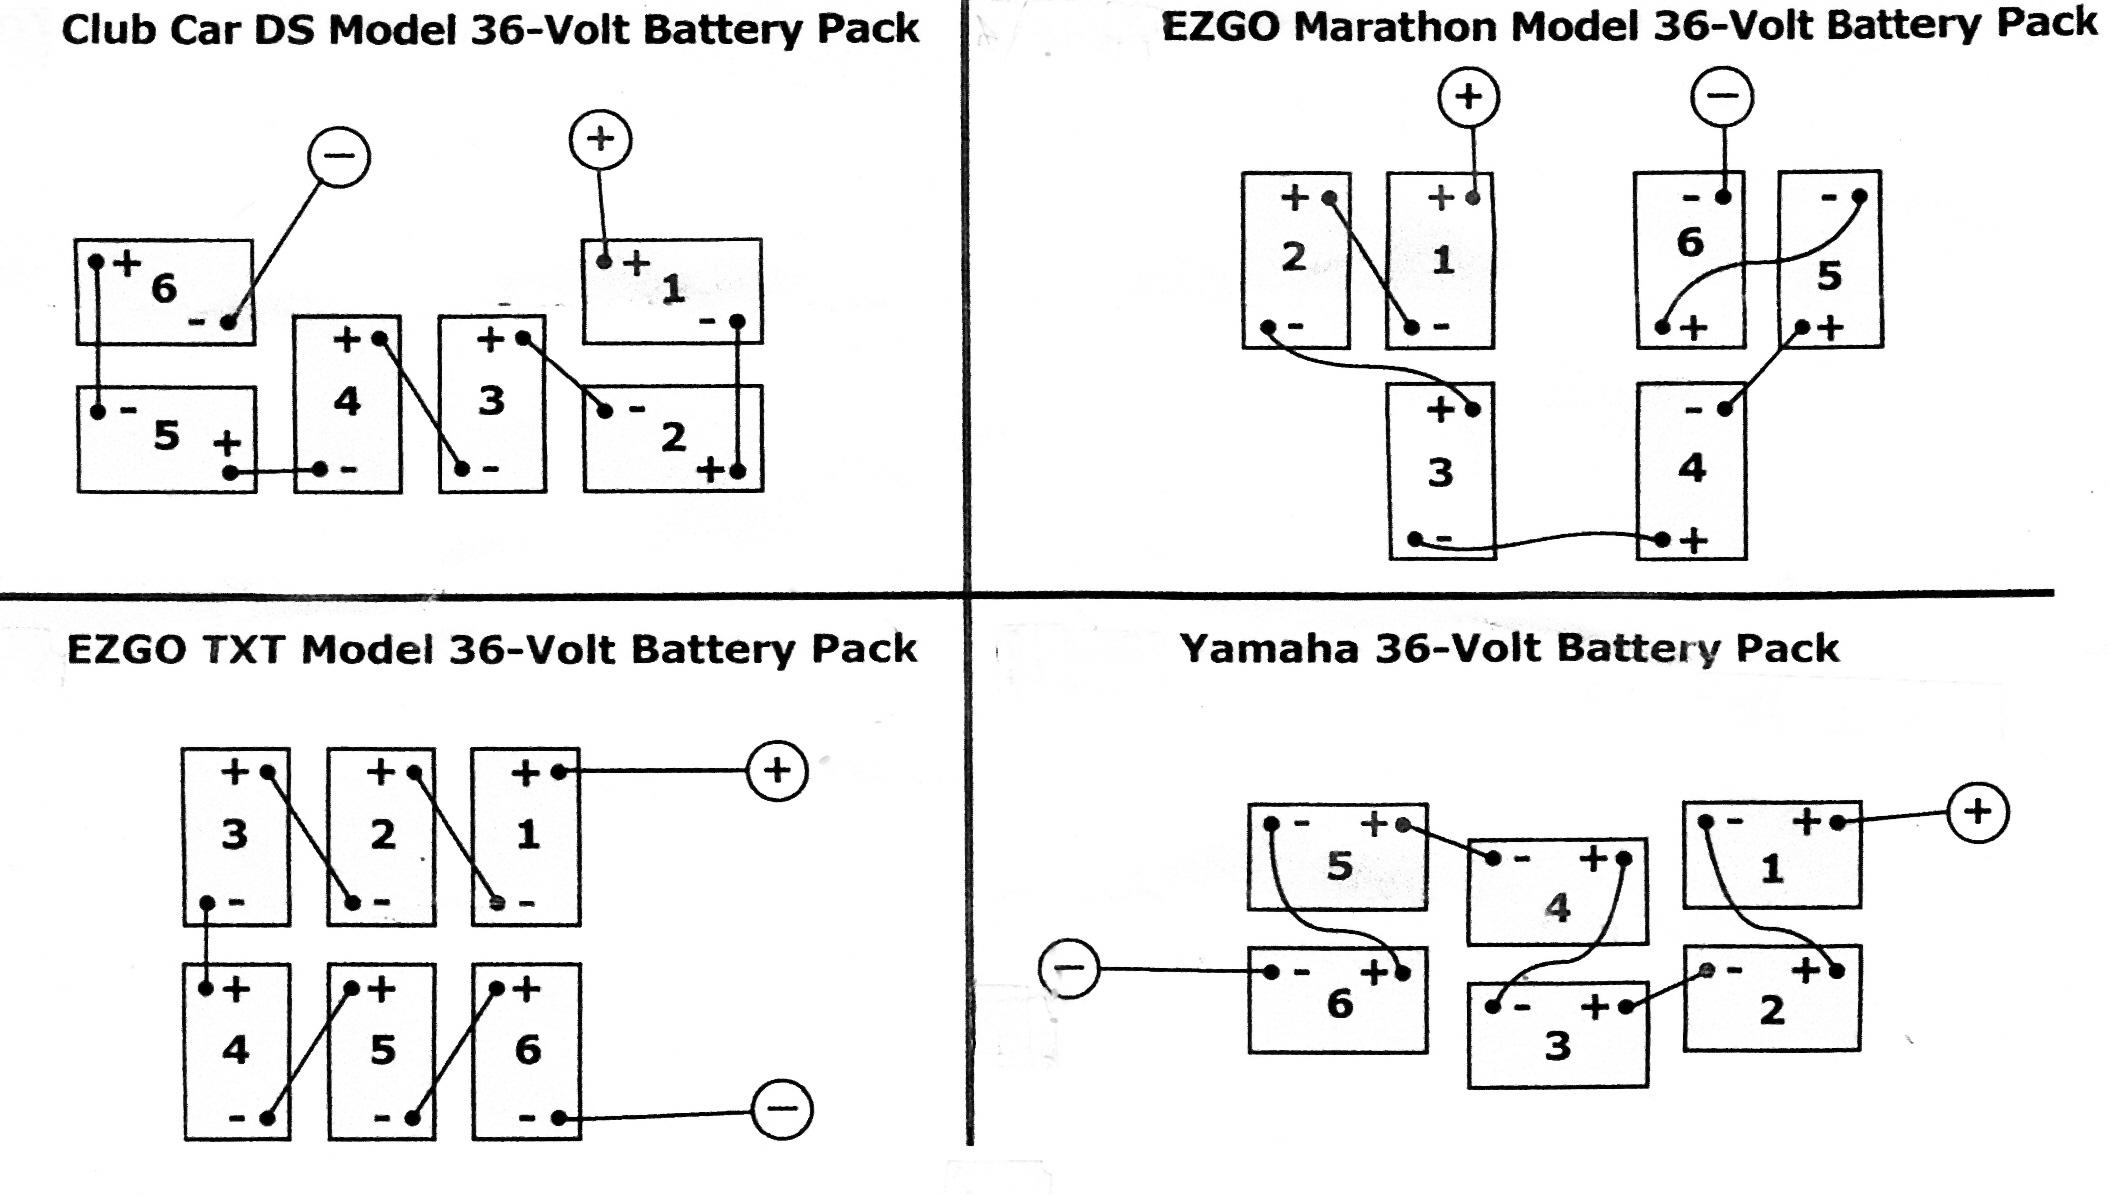 Club Car Golf Cart Battery Wiring Diagram 36 Volt Powerdrive 3 With - Club Car Wiring Diagram 36 Volt